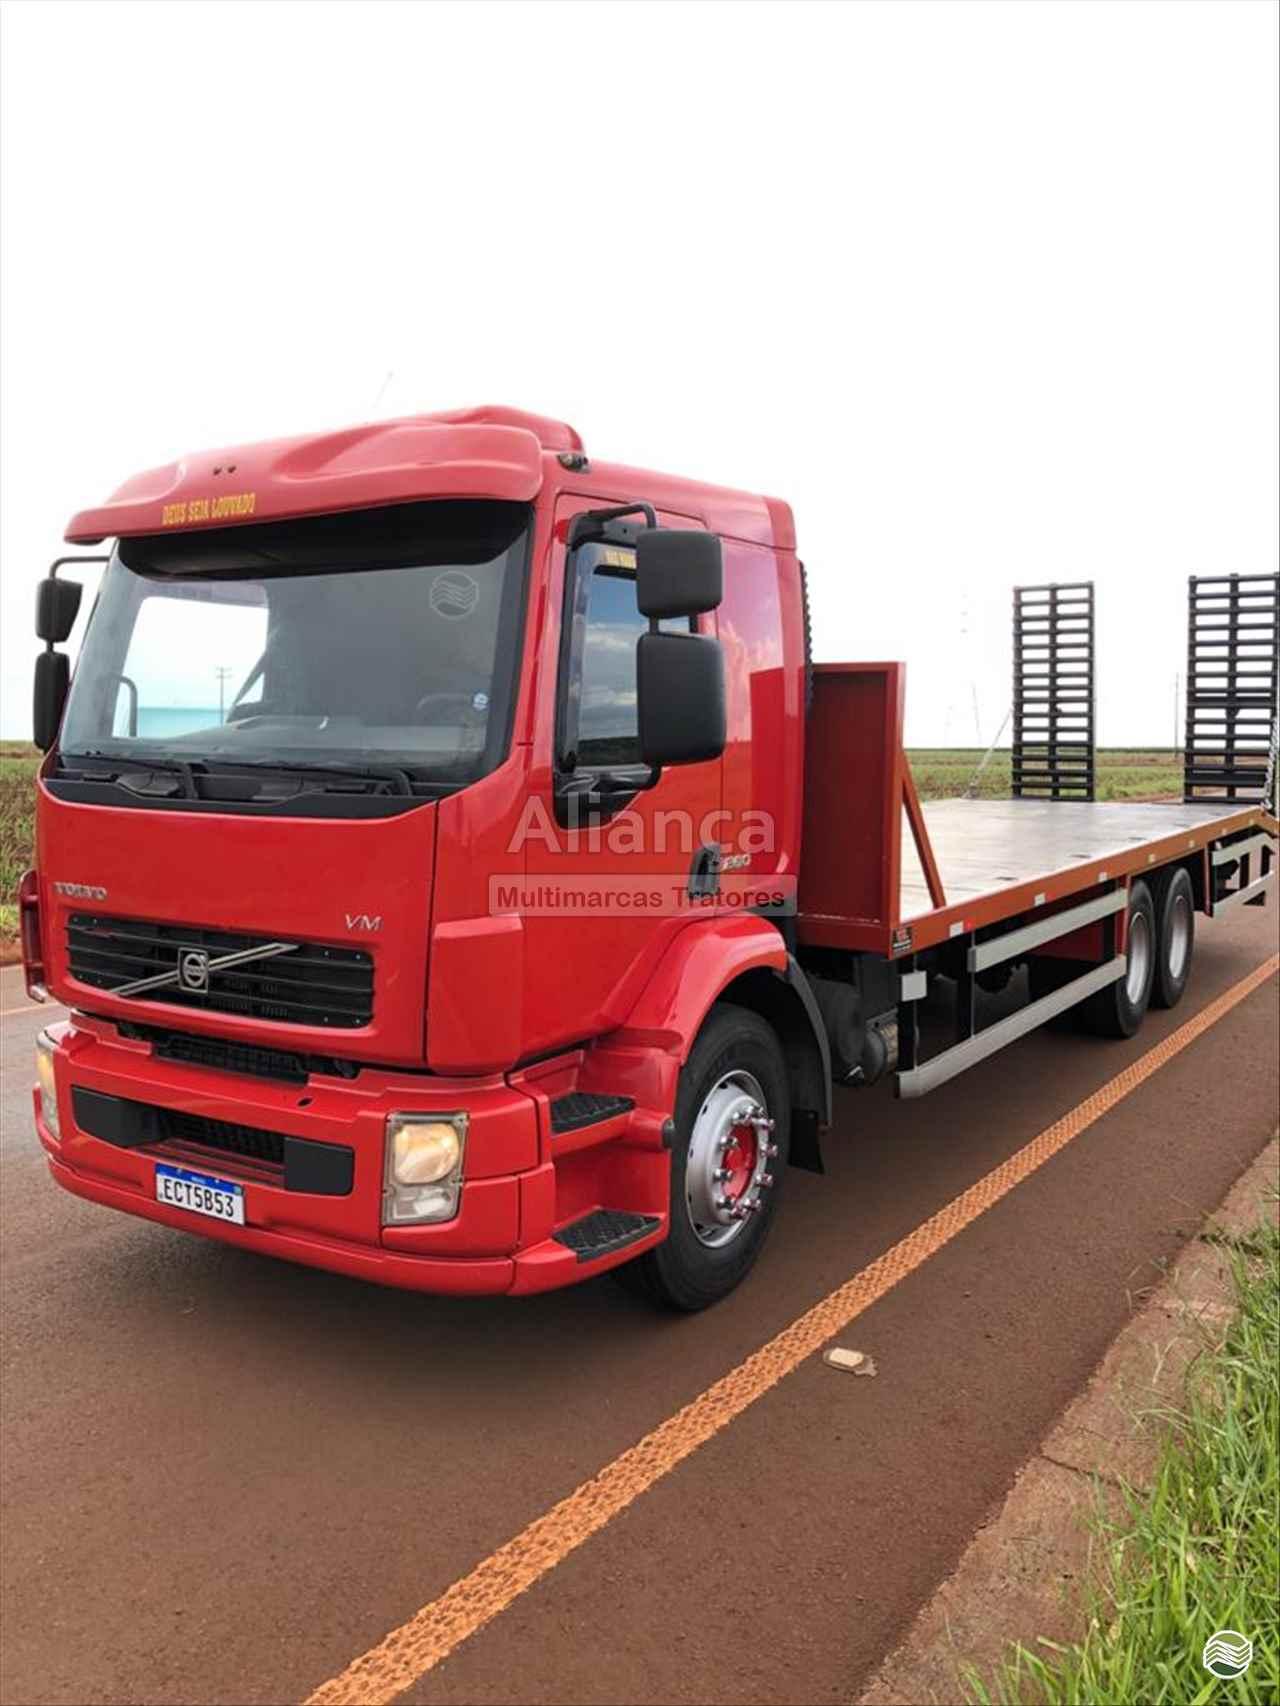 CAMINHAO VOLVO VOLVO VM 260 Plataforma Truck 6x2 Aliança Multimarcas Tratores UBIRAJARA SÃO PAULO SP